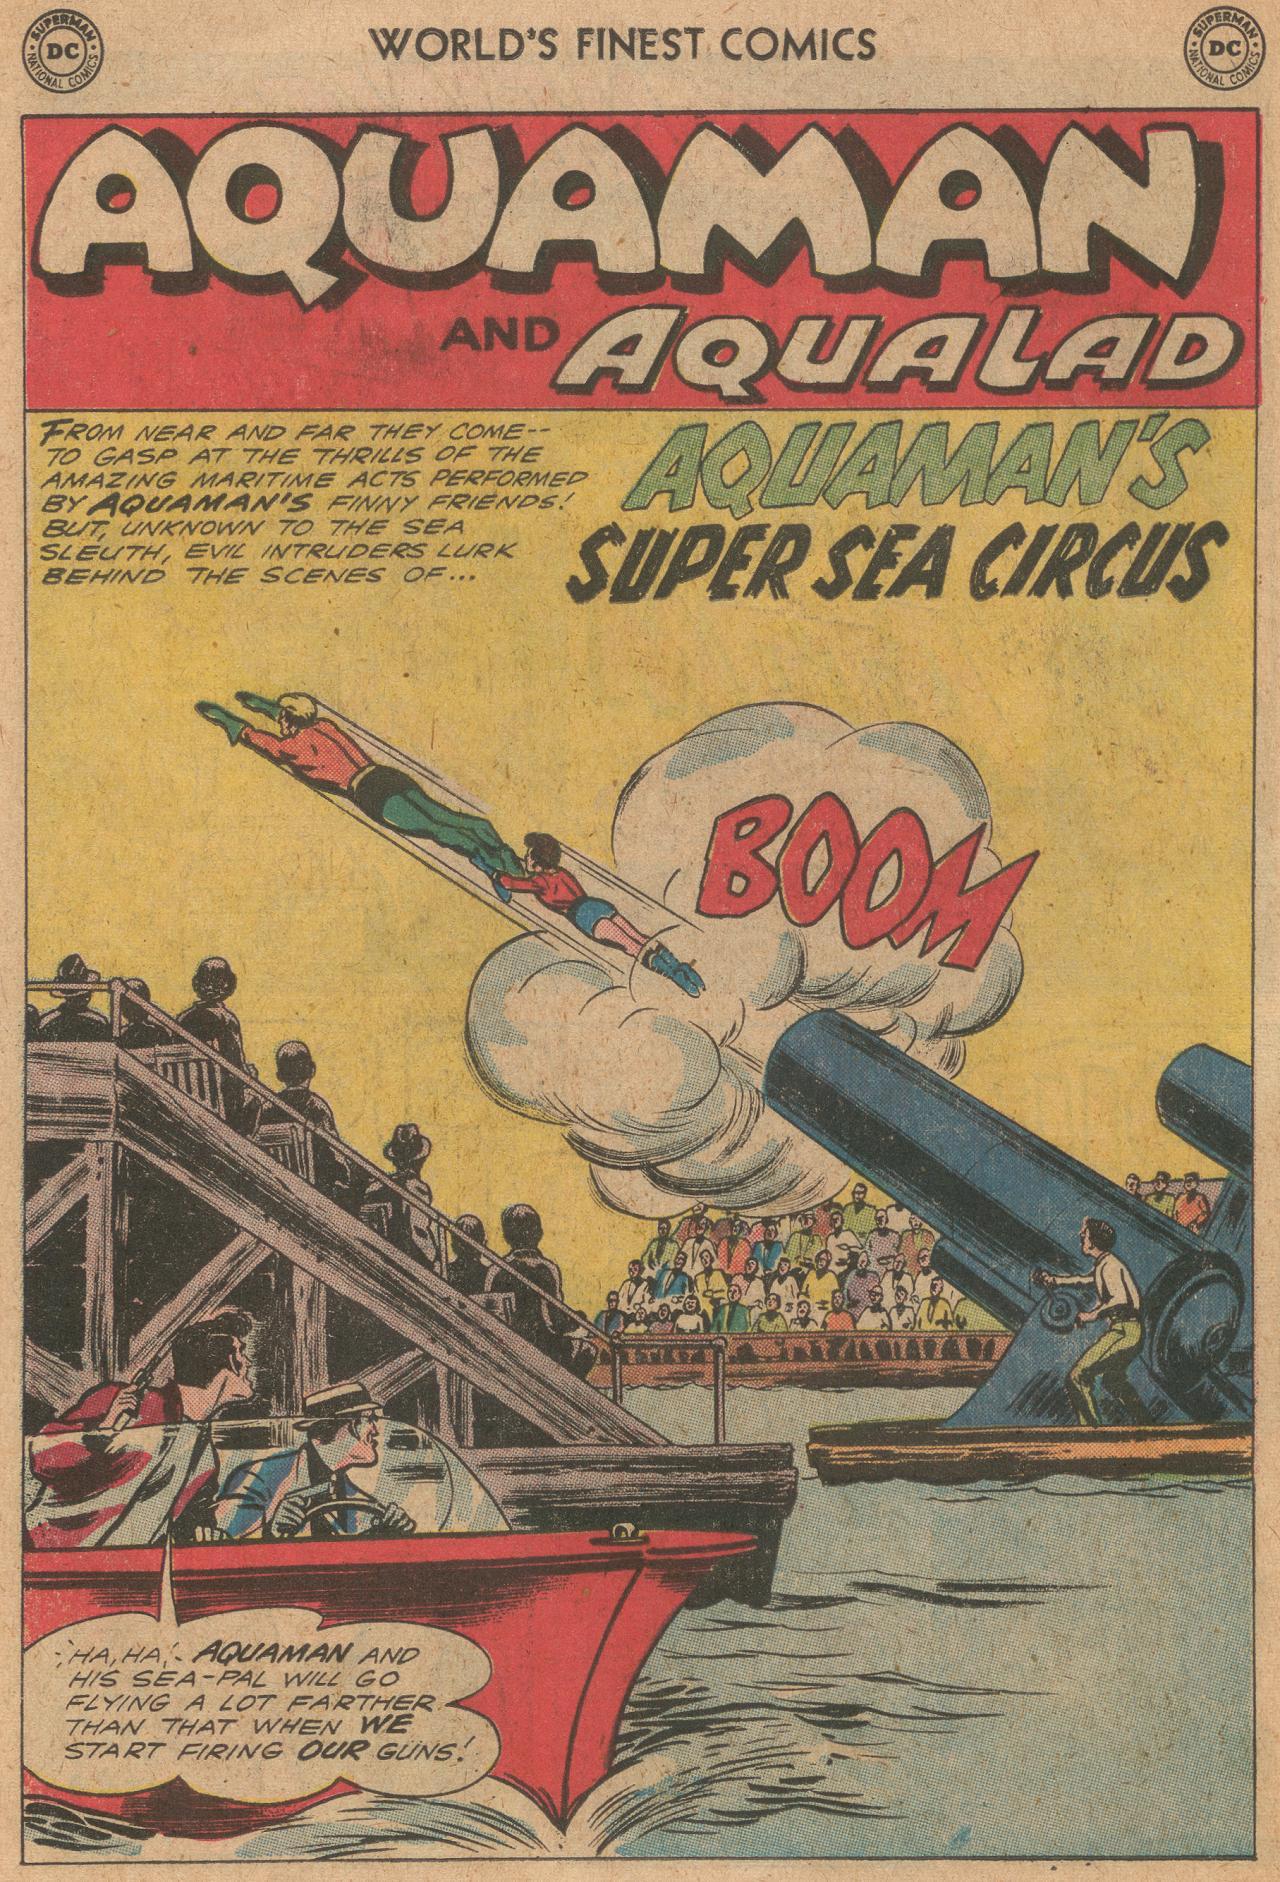 Read online World's Finest Comics comic -  Issue #126 - 16